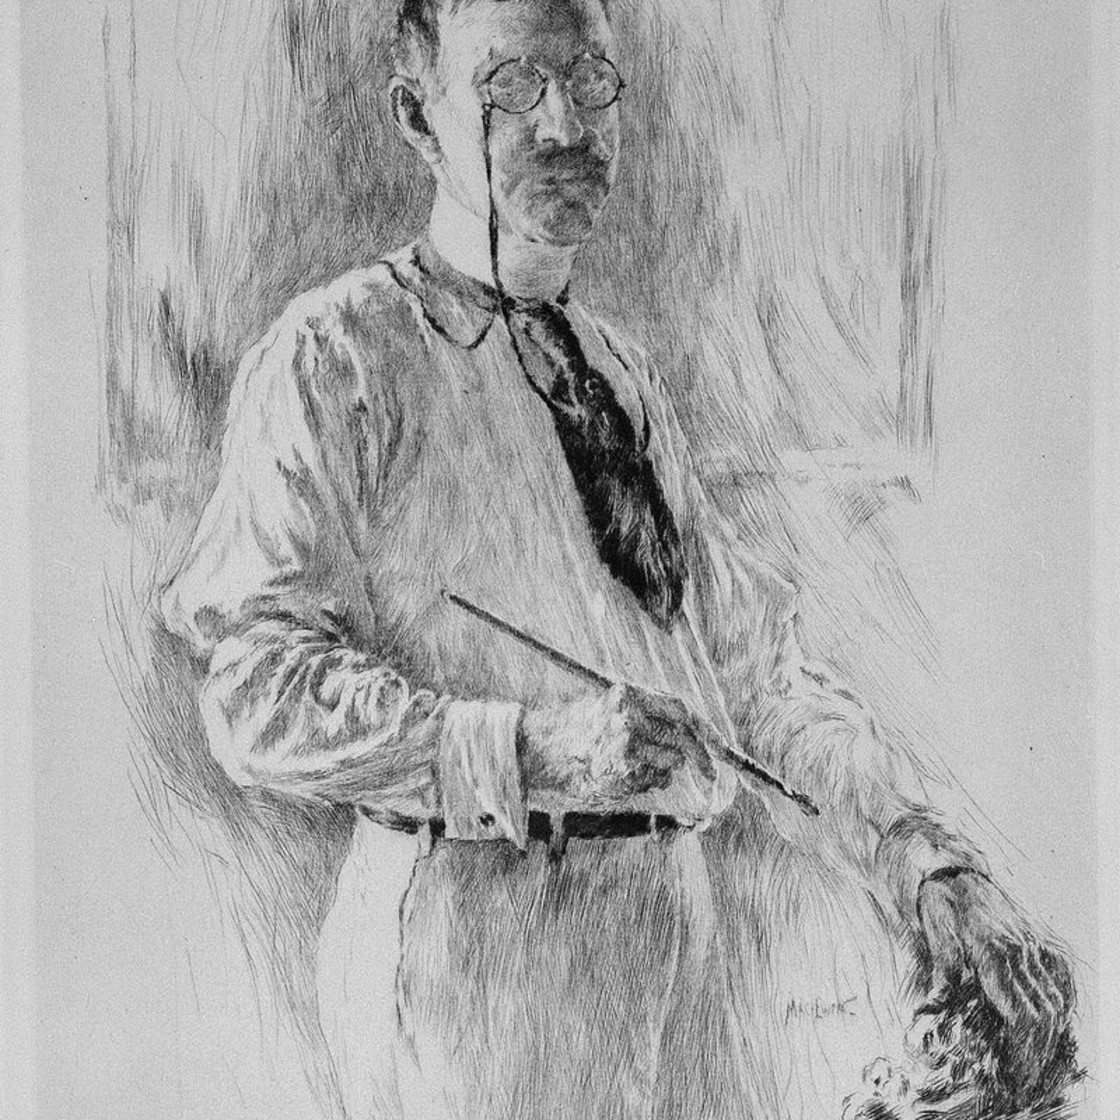 Walter McEwen